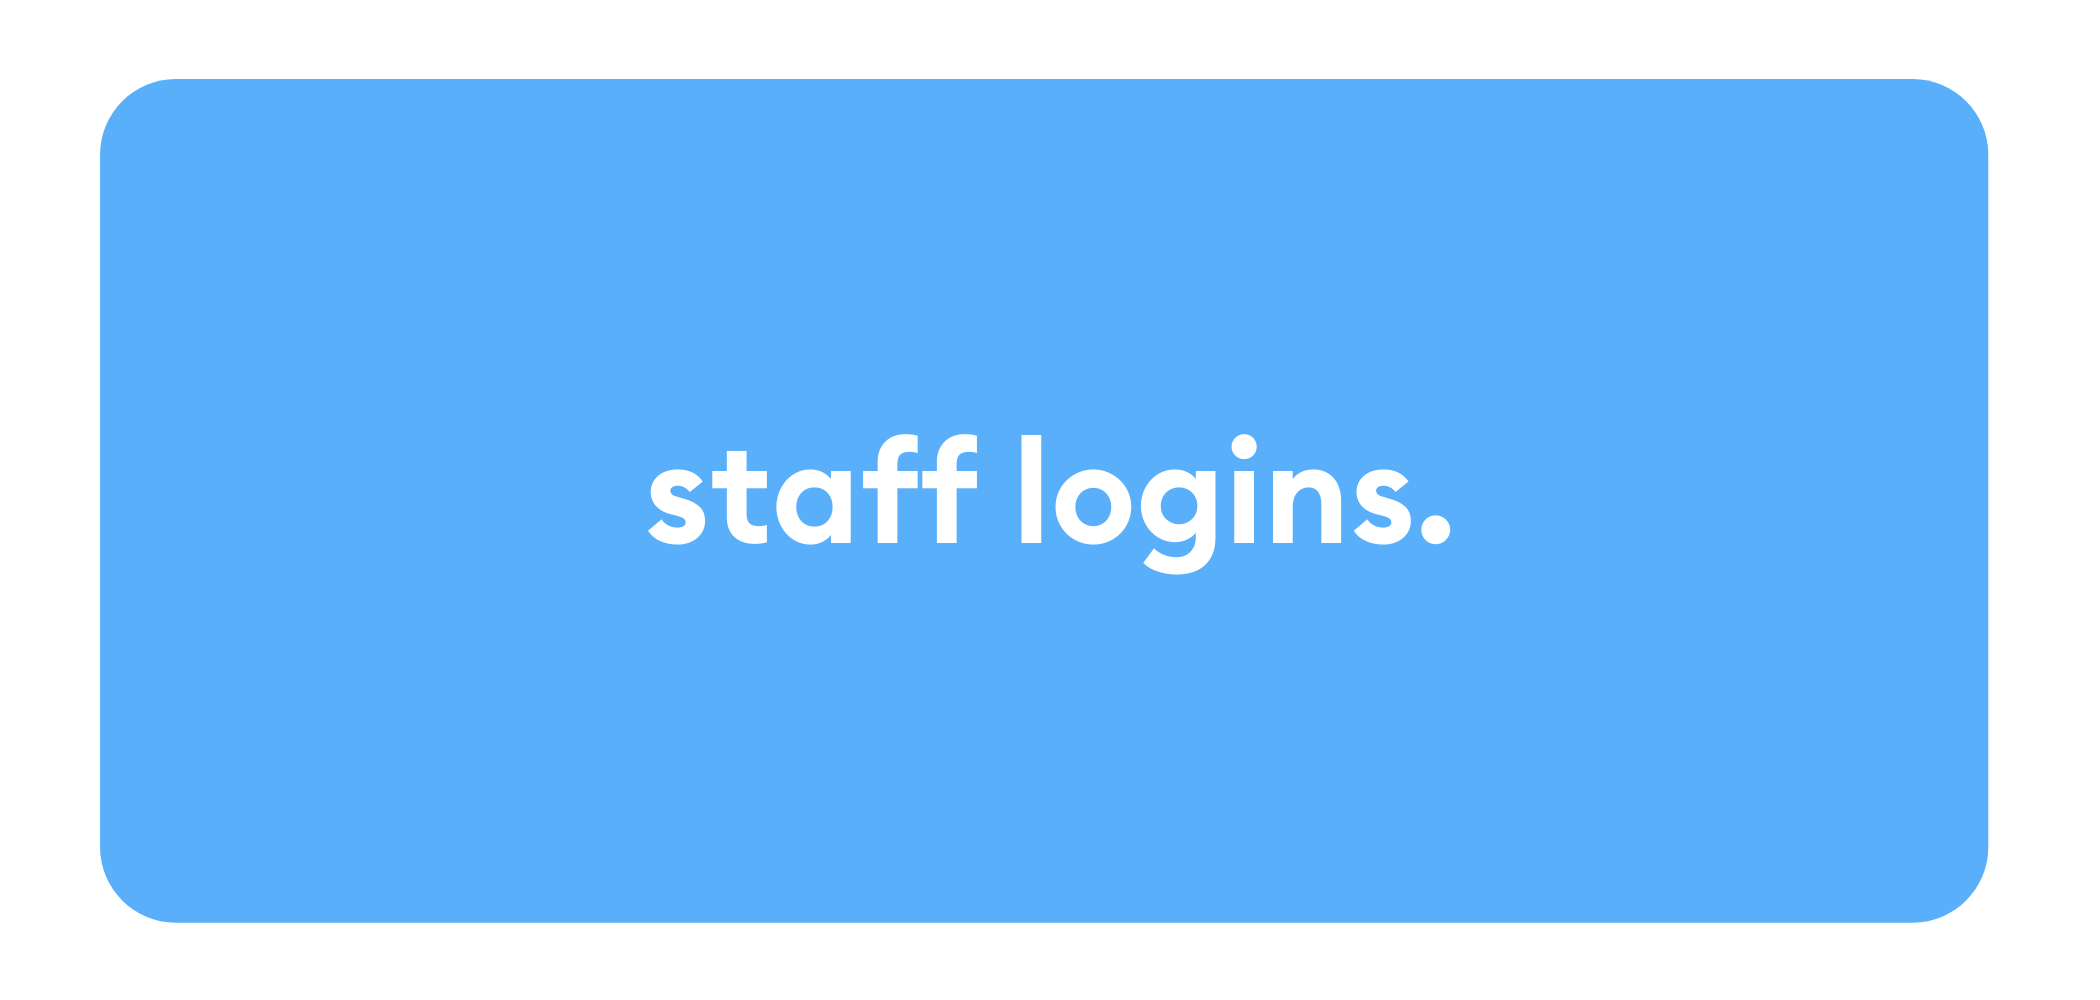 setmore staff logins